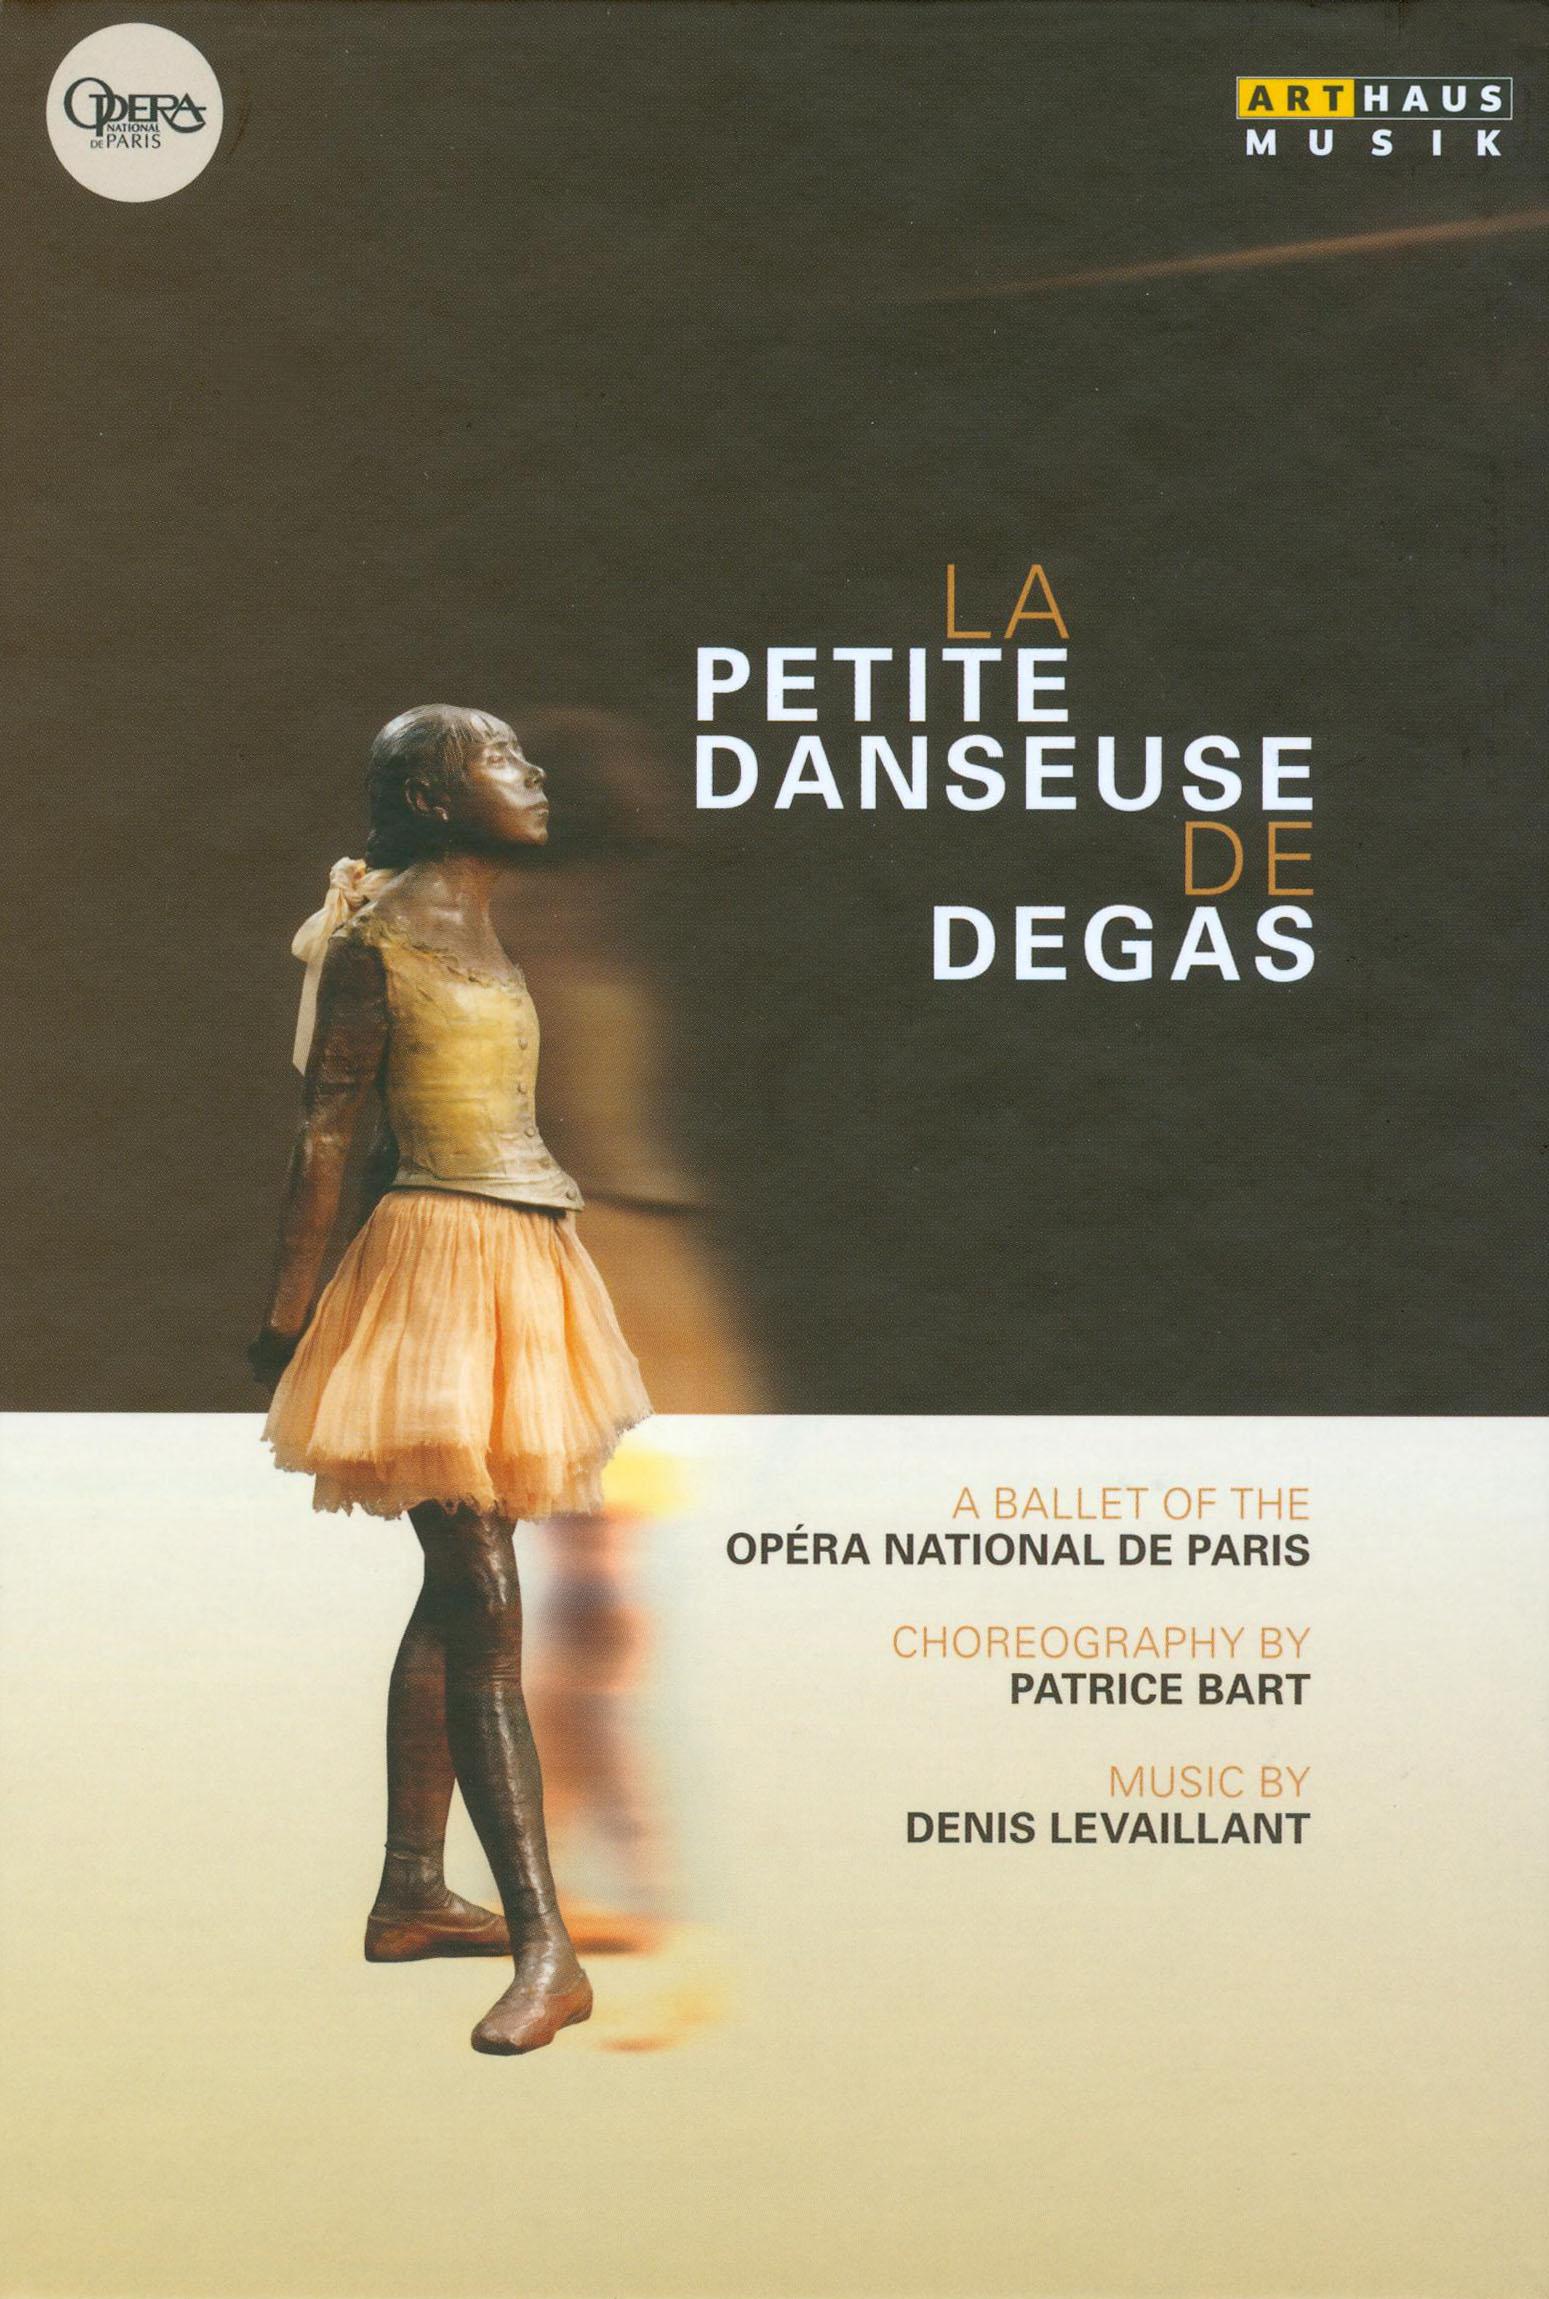 La Petite Danseuse de Degas (Paris Opera Ballet)